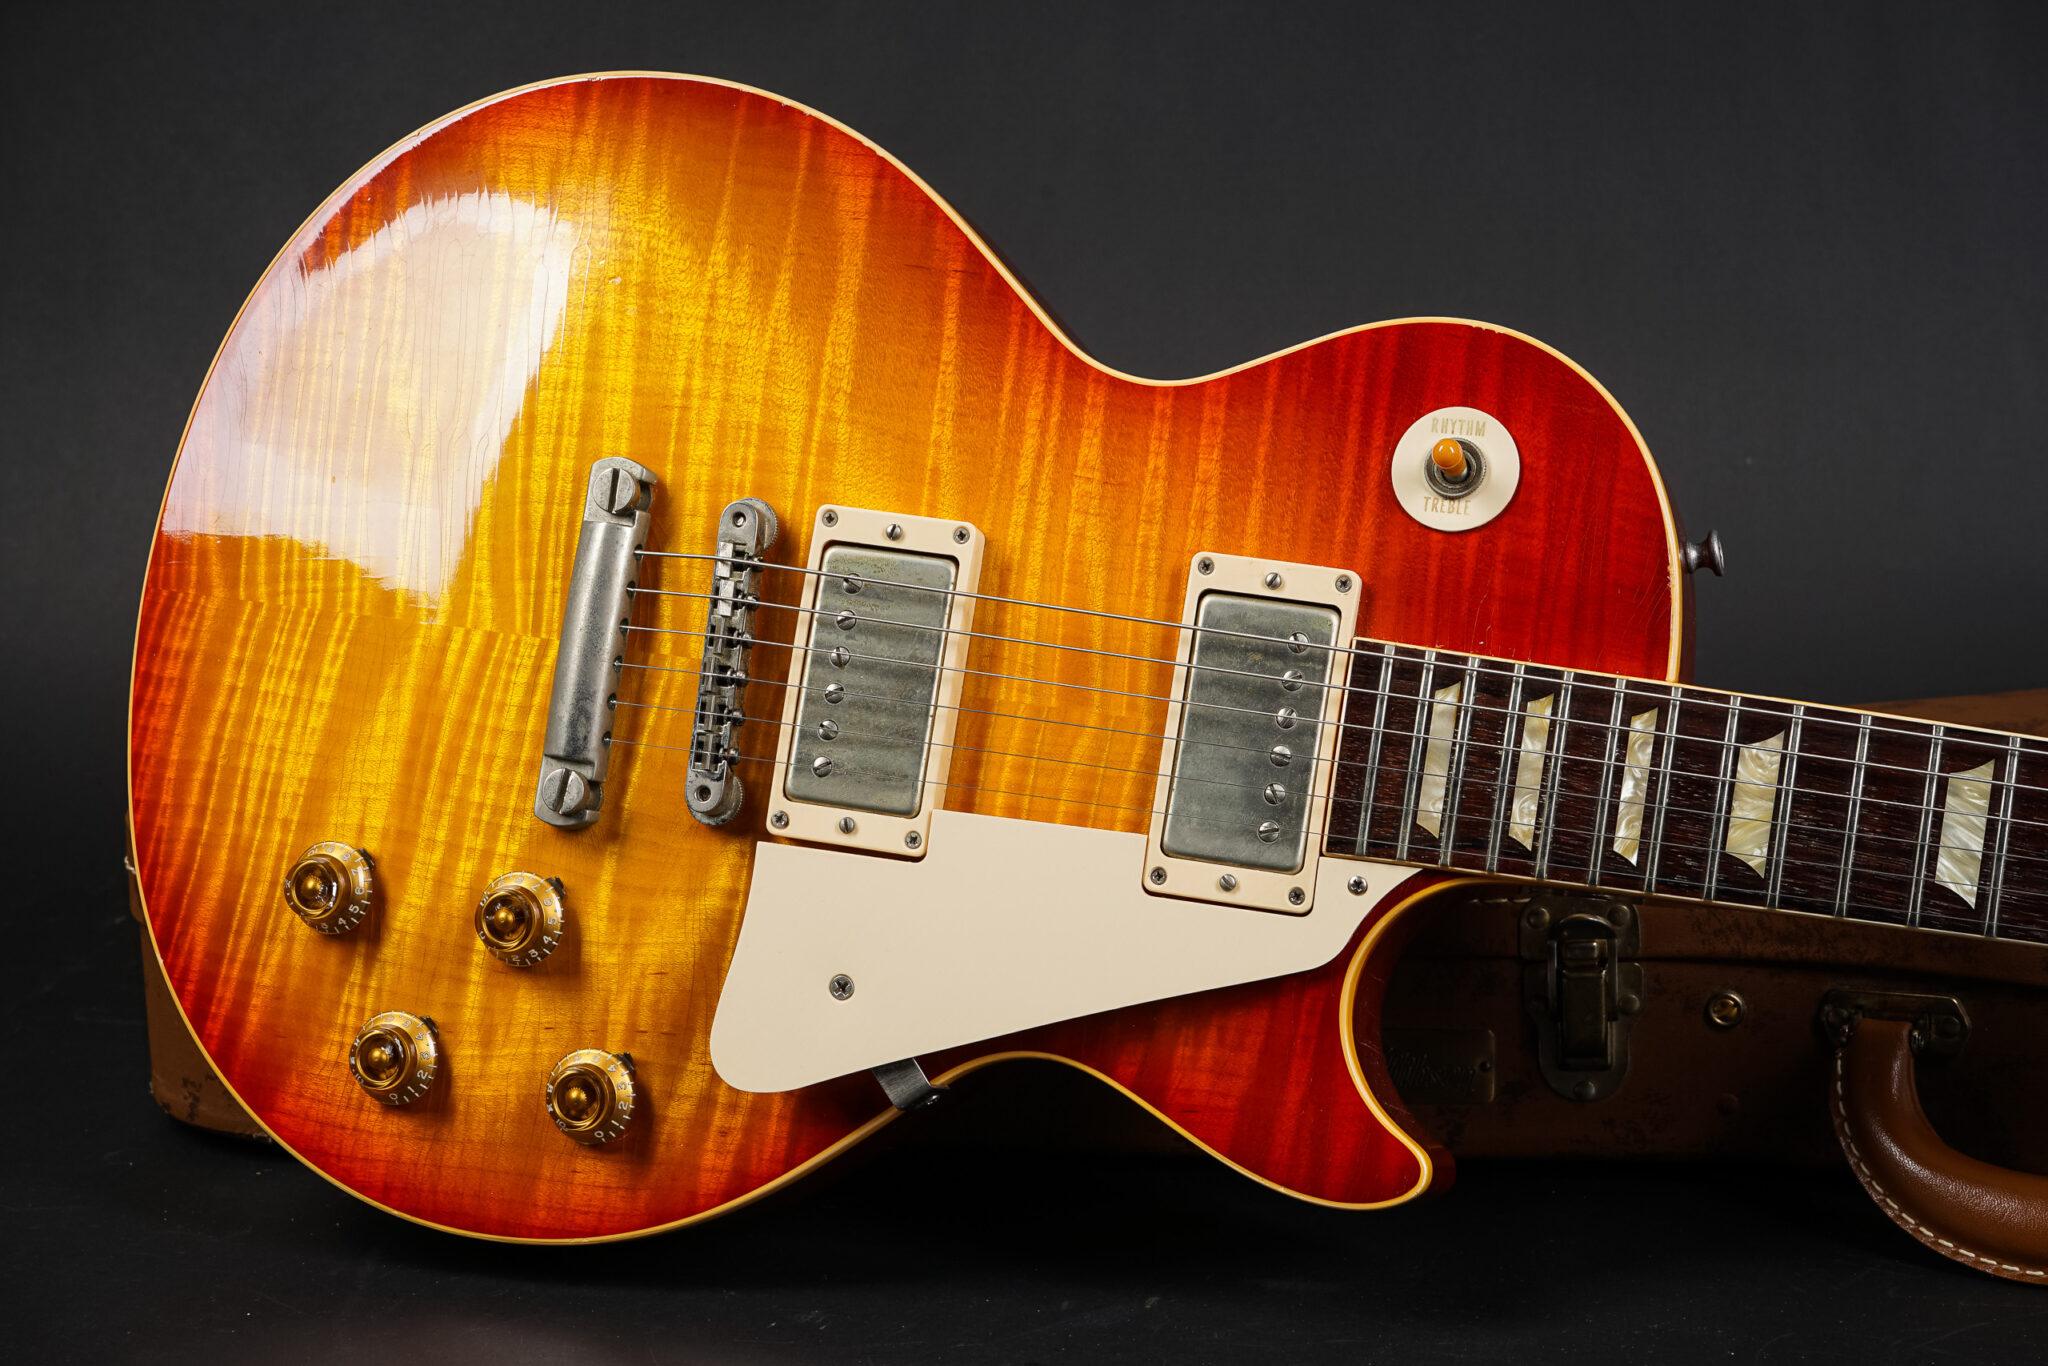 https://guitarpoint.de/app/uploads/products/2003-gibson-les-paul-1959-standard-reissue-stinger-murphy-aged/2003-Gibson-Les-Paul-1959-Les-Paul-Stinger-Murphy-Aged-931564-8-2048x1366.jpg